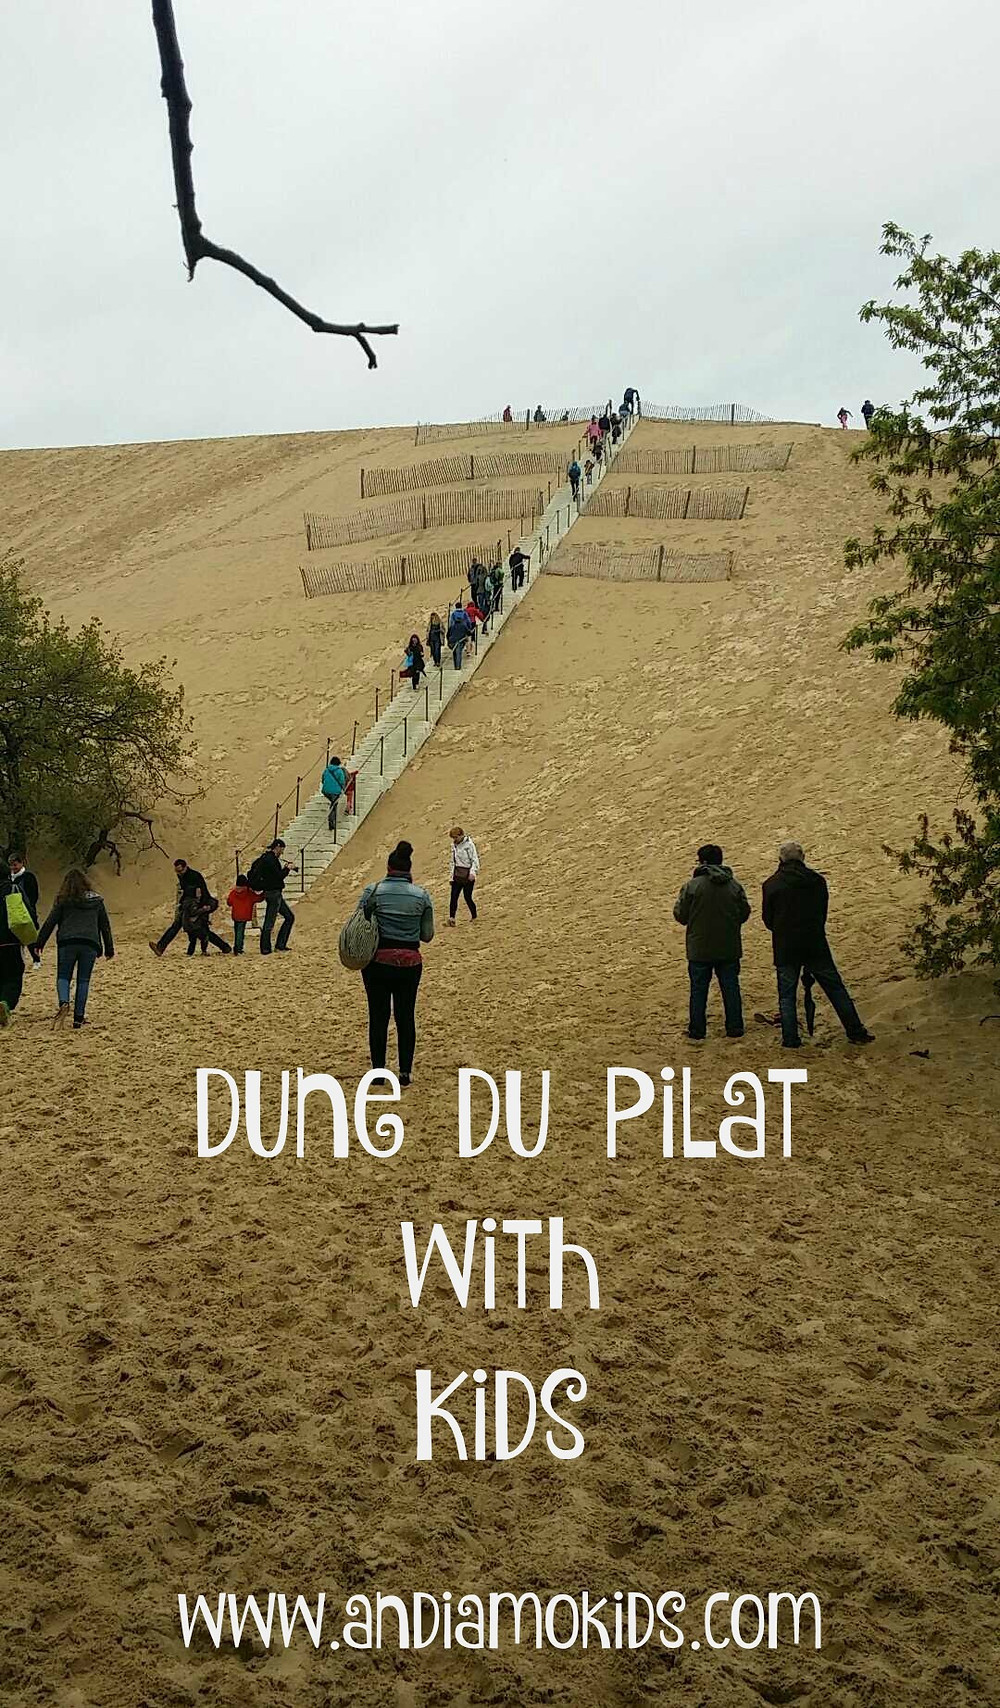 Dune du Pilat with Kids